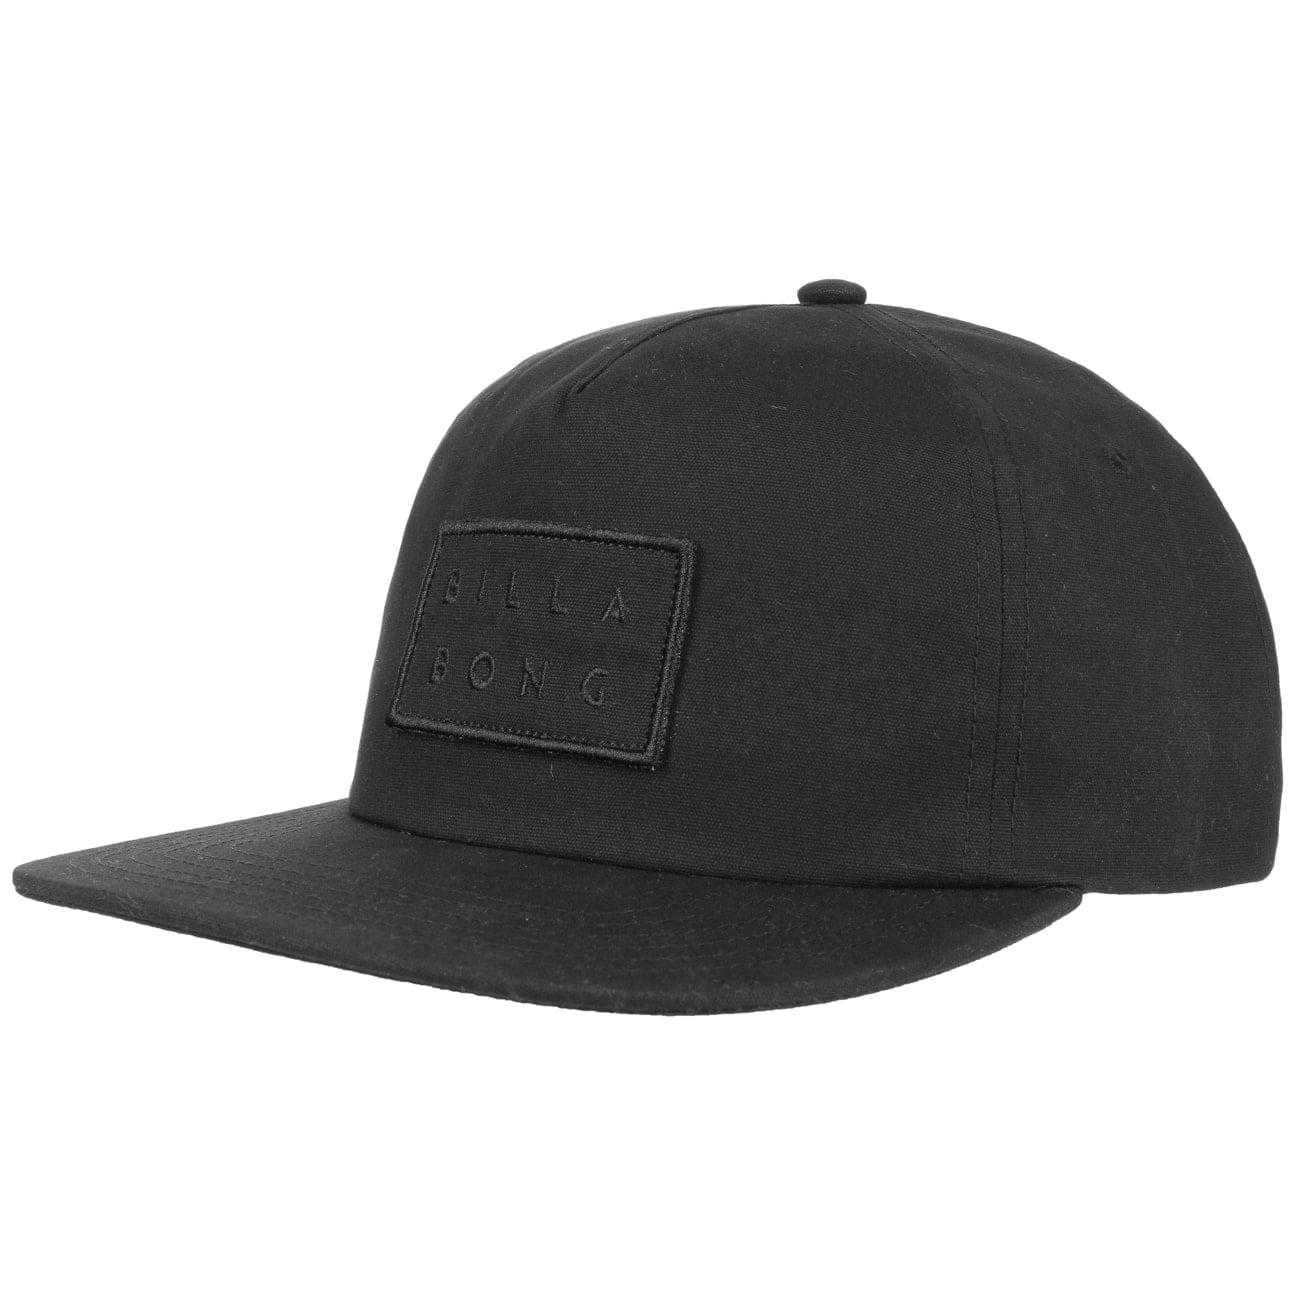 Casquette Die Cut Snapback by Billabong  baseball cap